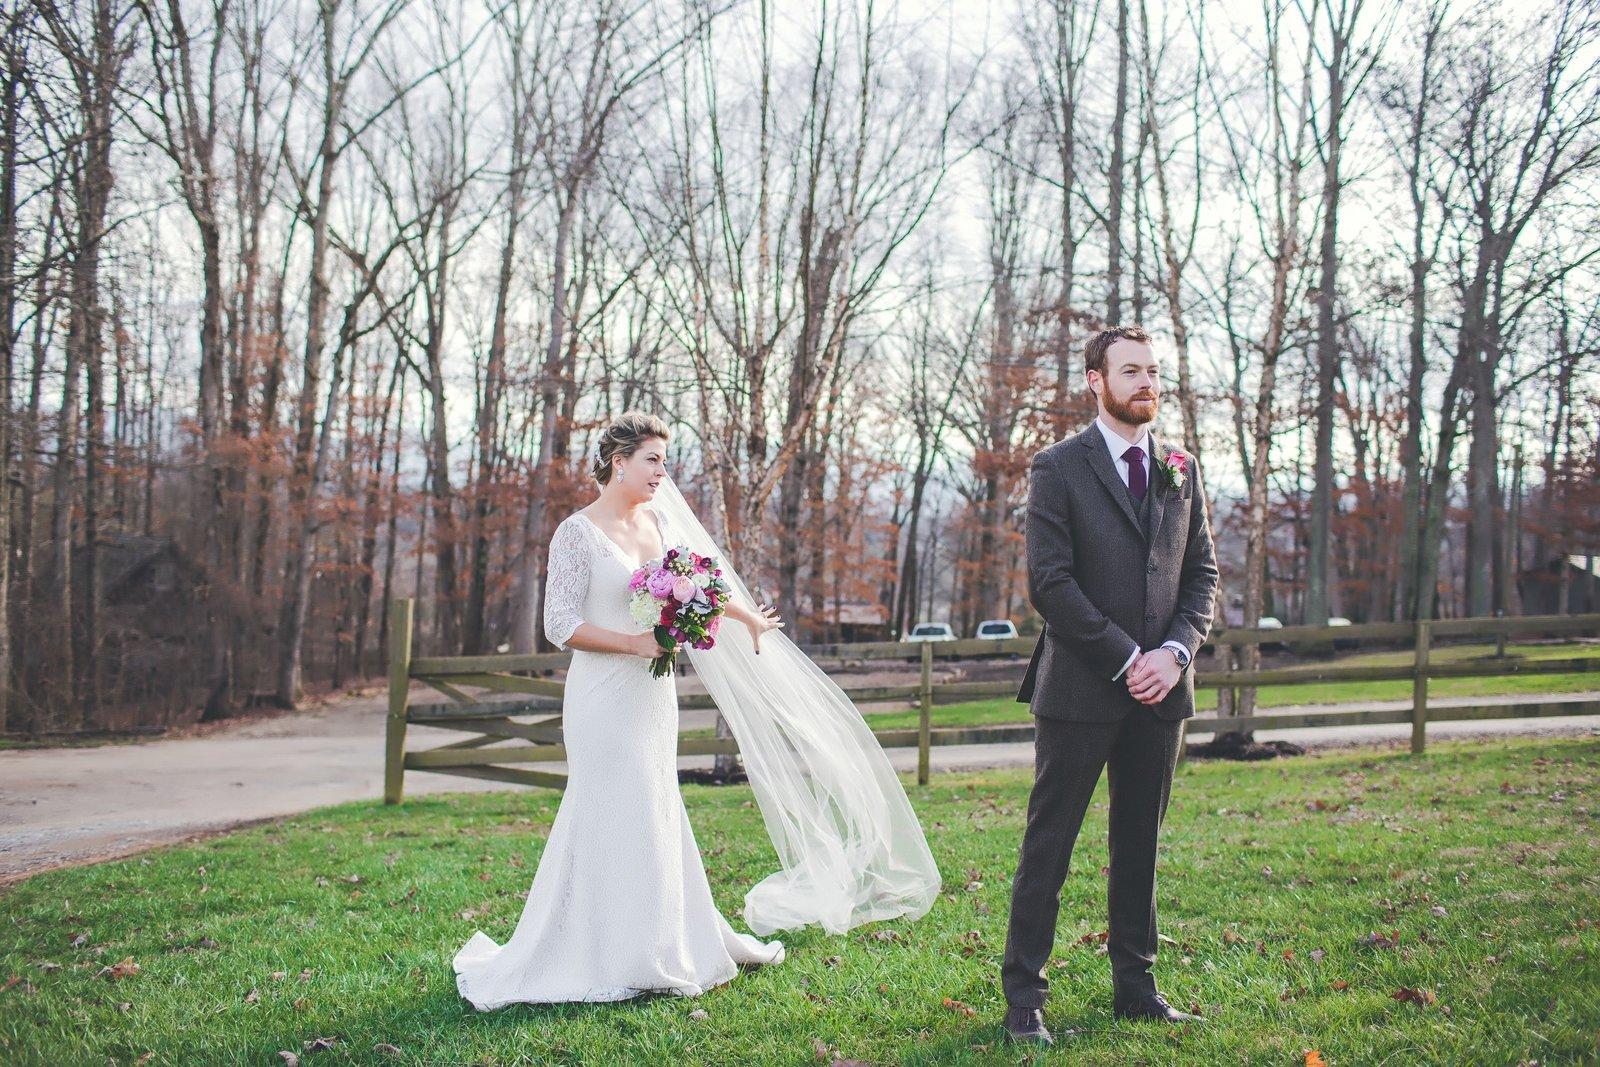 ashevilledestinationweddingphotographer_Biltmore_BrenPhotography_001